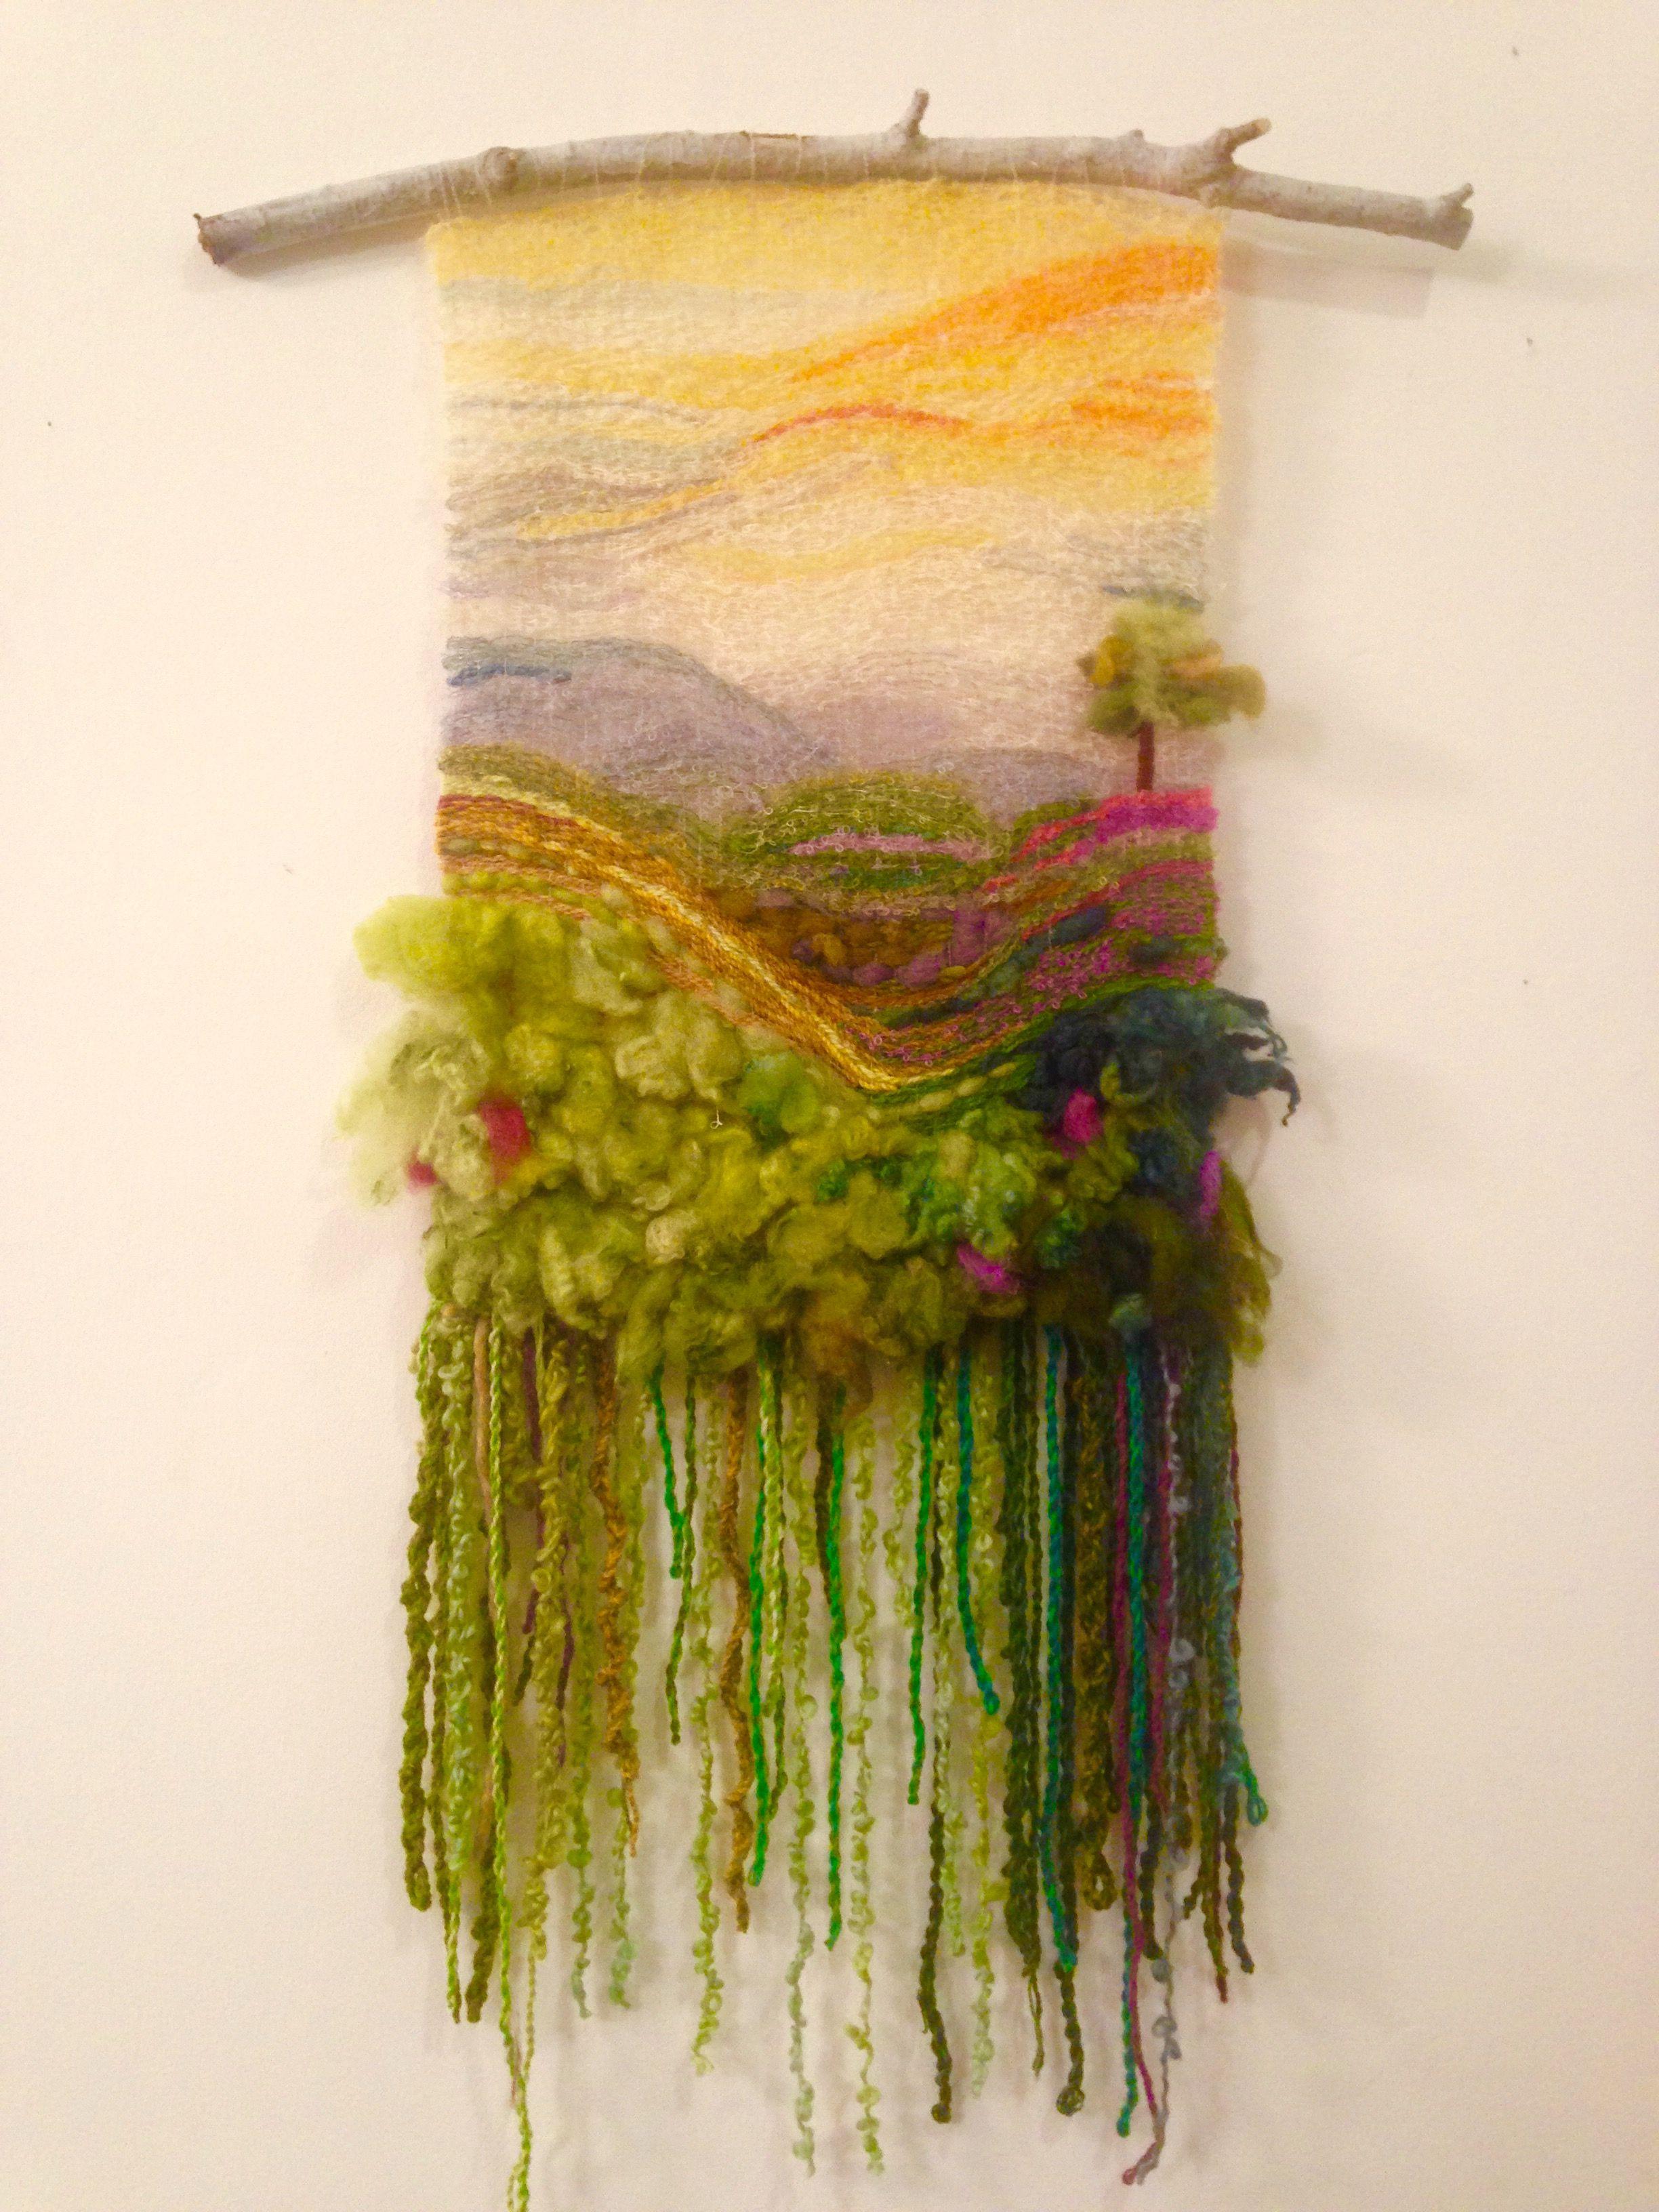 My first weave | Fiber art | Pinterest | Fiber art, Tapestry weaving ...